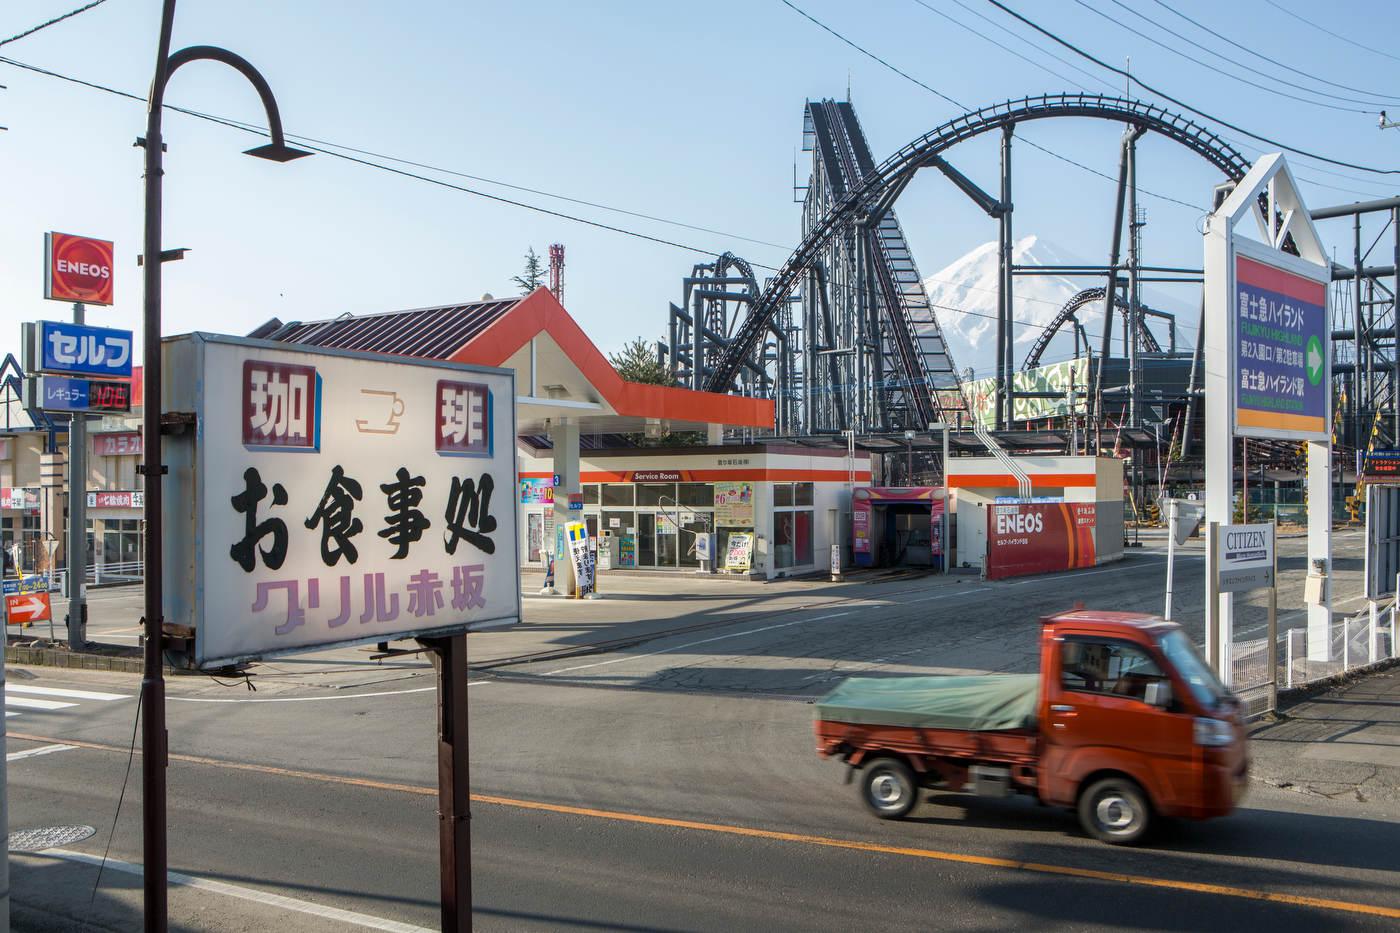 Mt. Fuji, framed by an amusement park roller coaster.